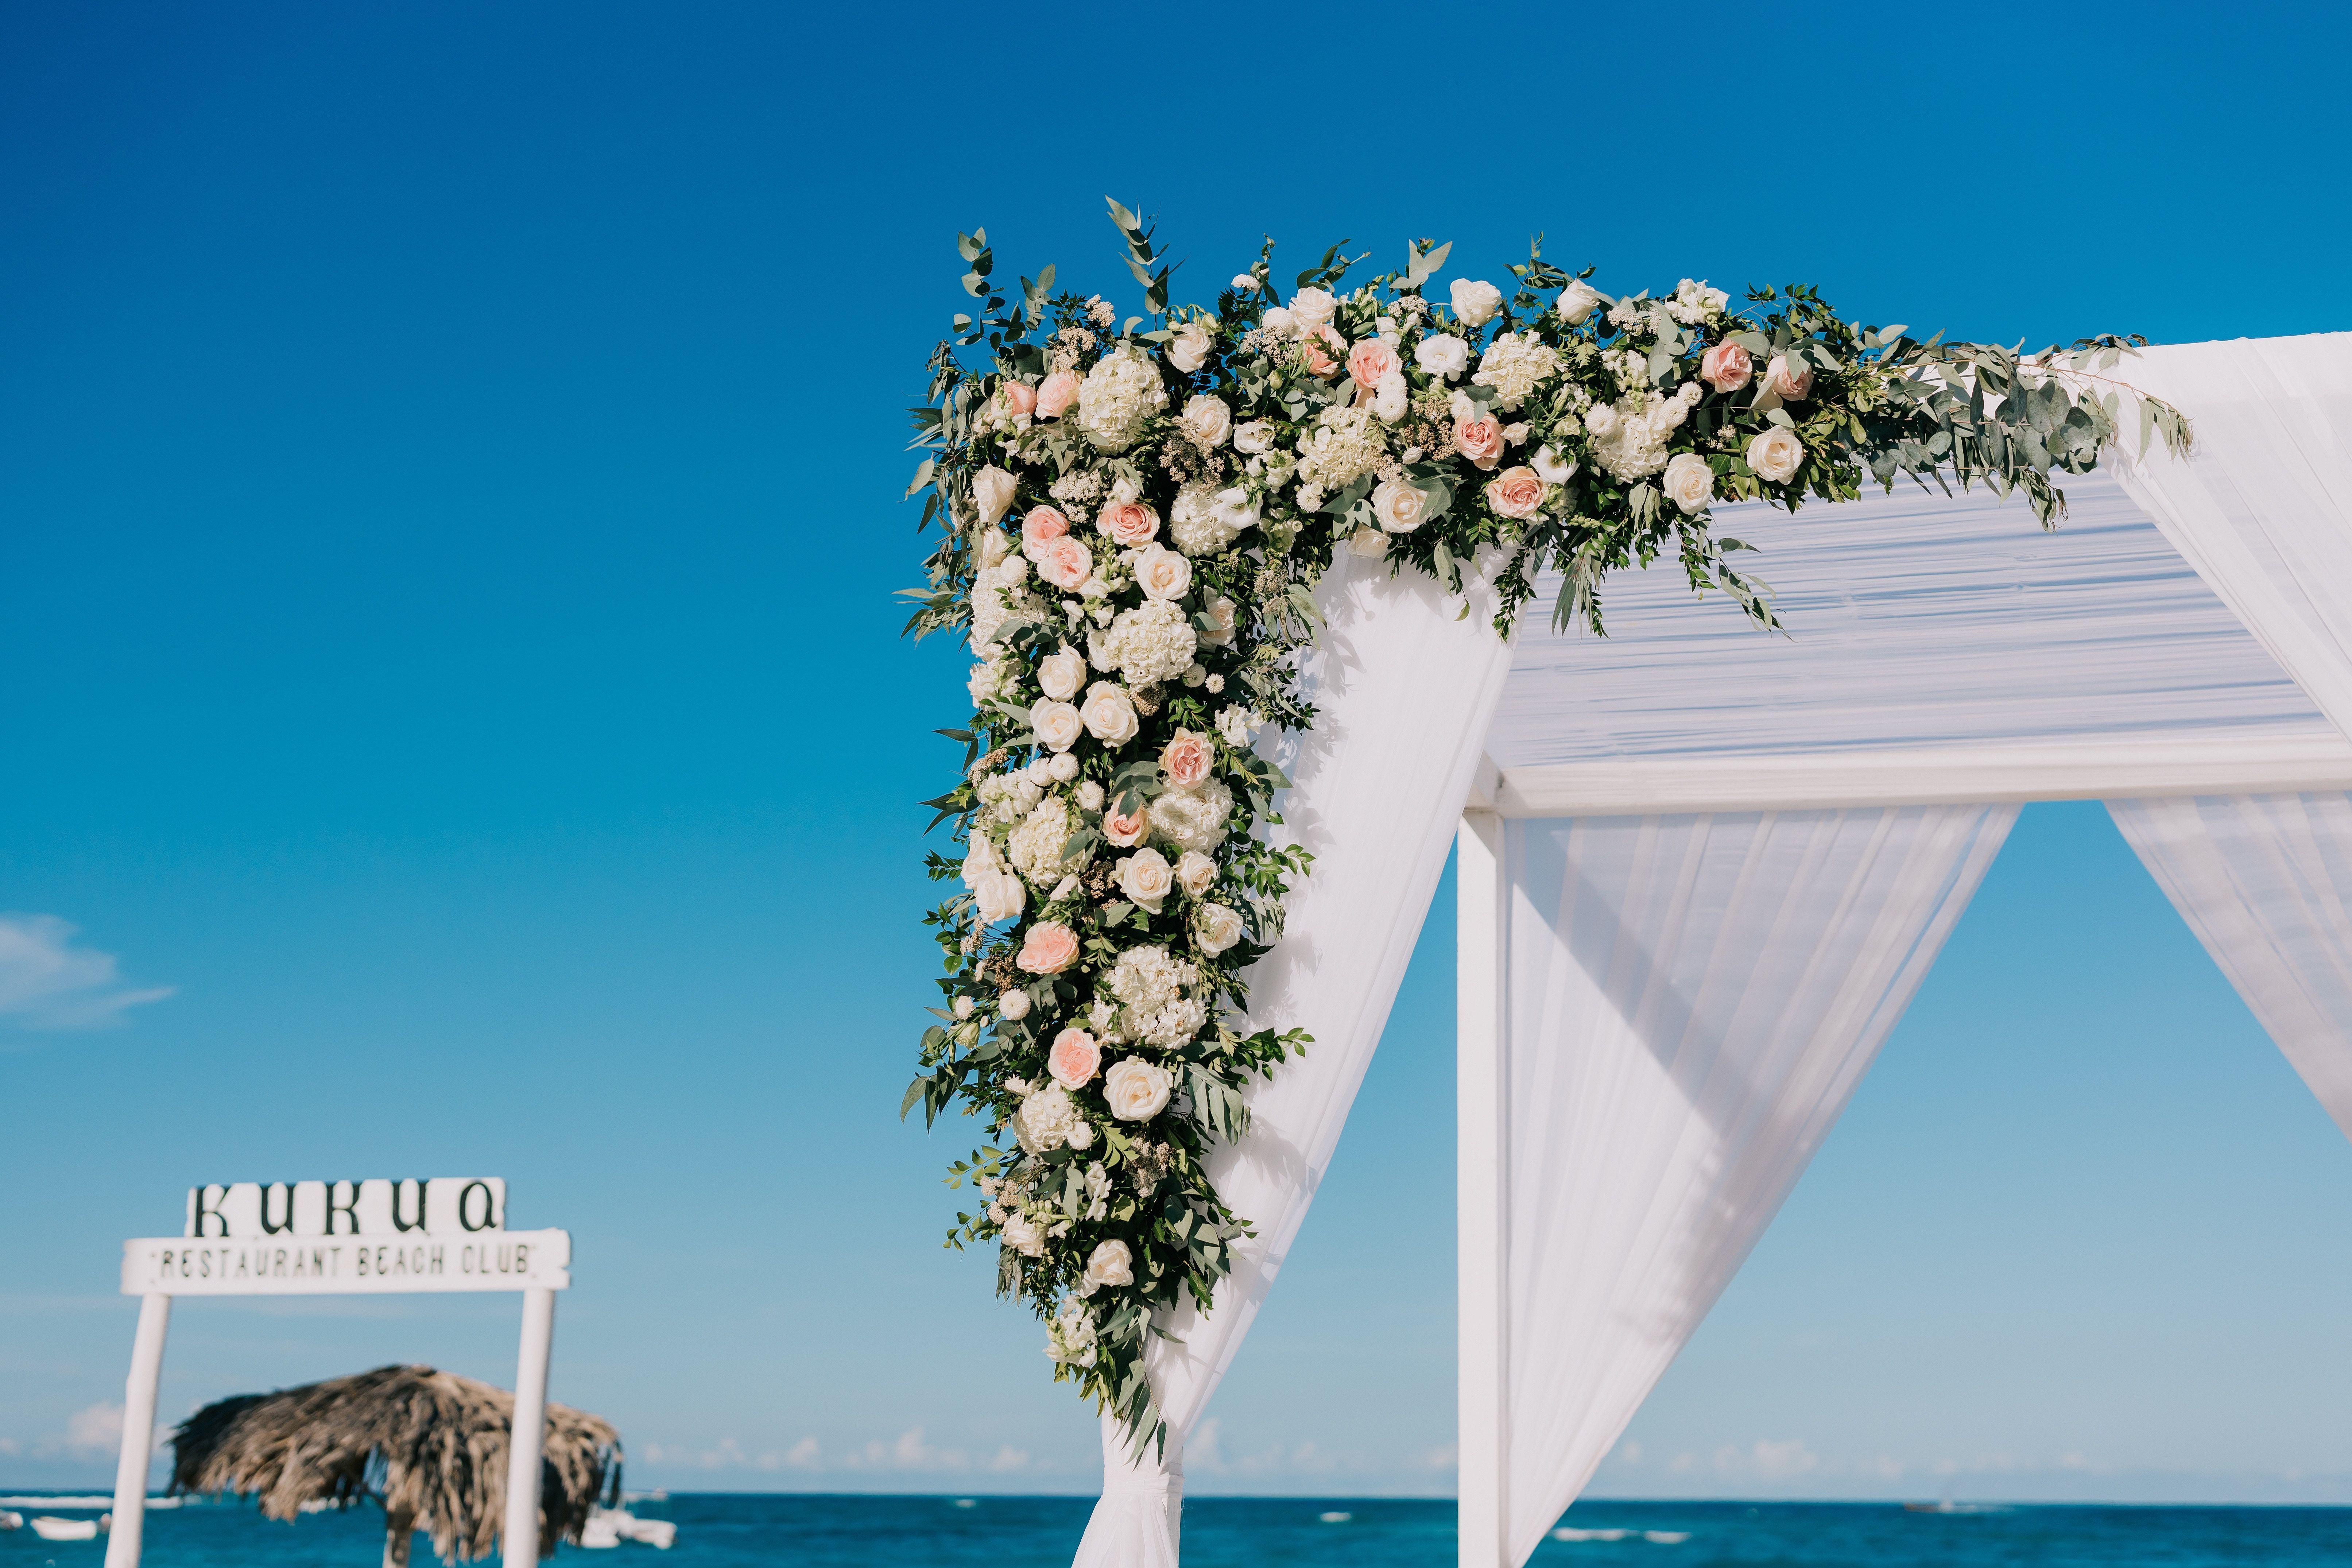 If You Are Having A Beach Wedding This Wedding Gazebo Arch Is